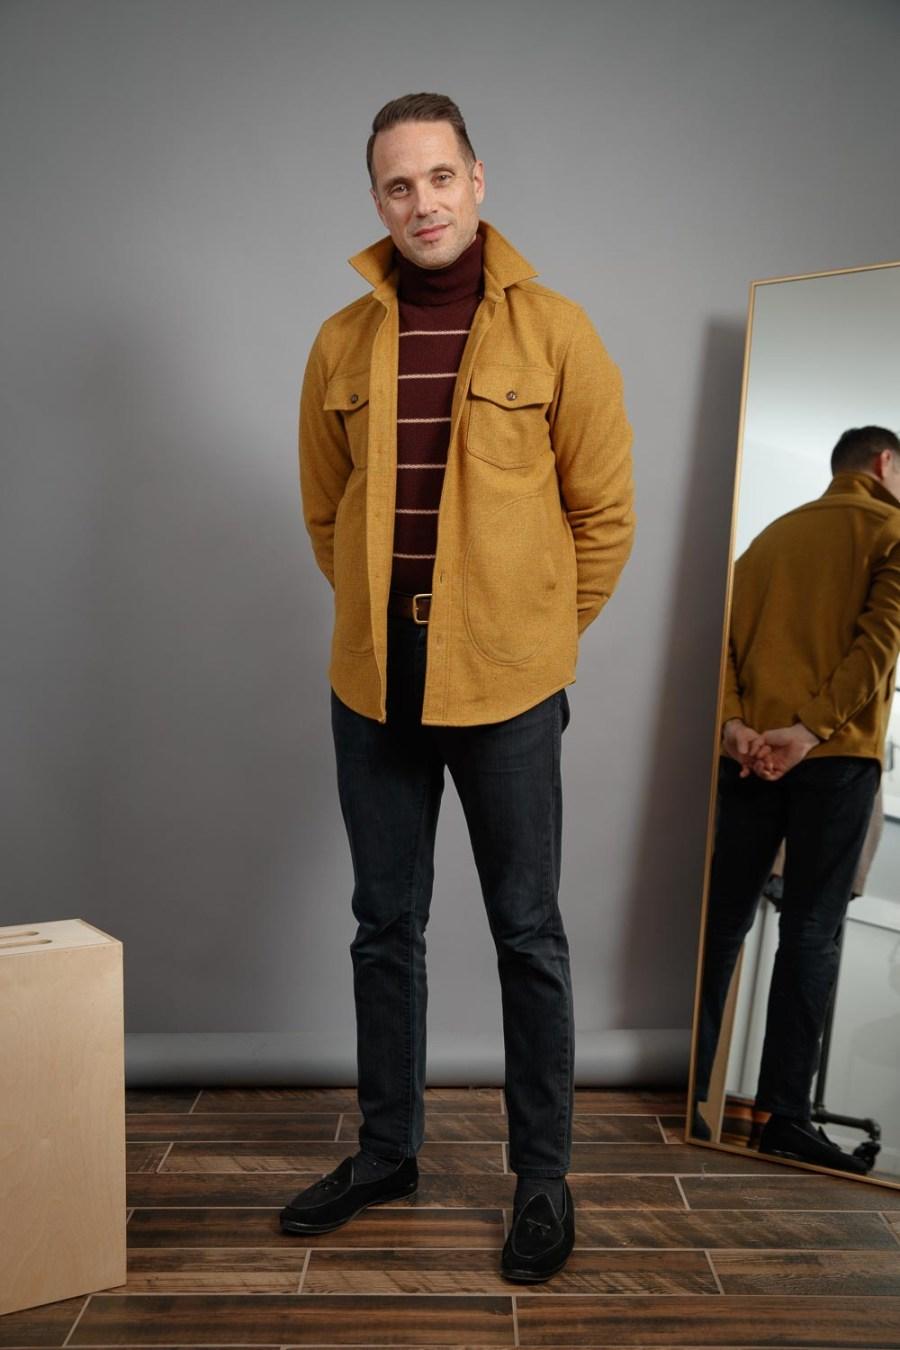 Winter-style-ideas-for-men-2021-burgundy-turtleneck-mens-shacket-black-jeans-belgian-shoes-nyc